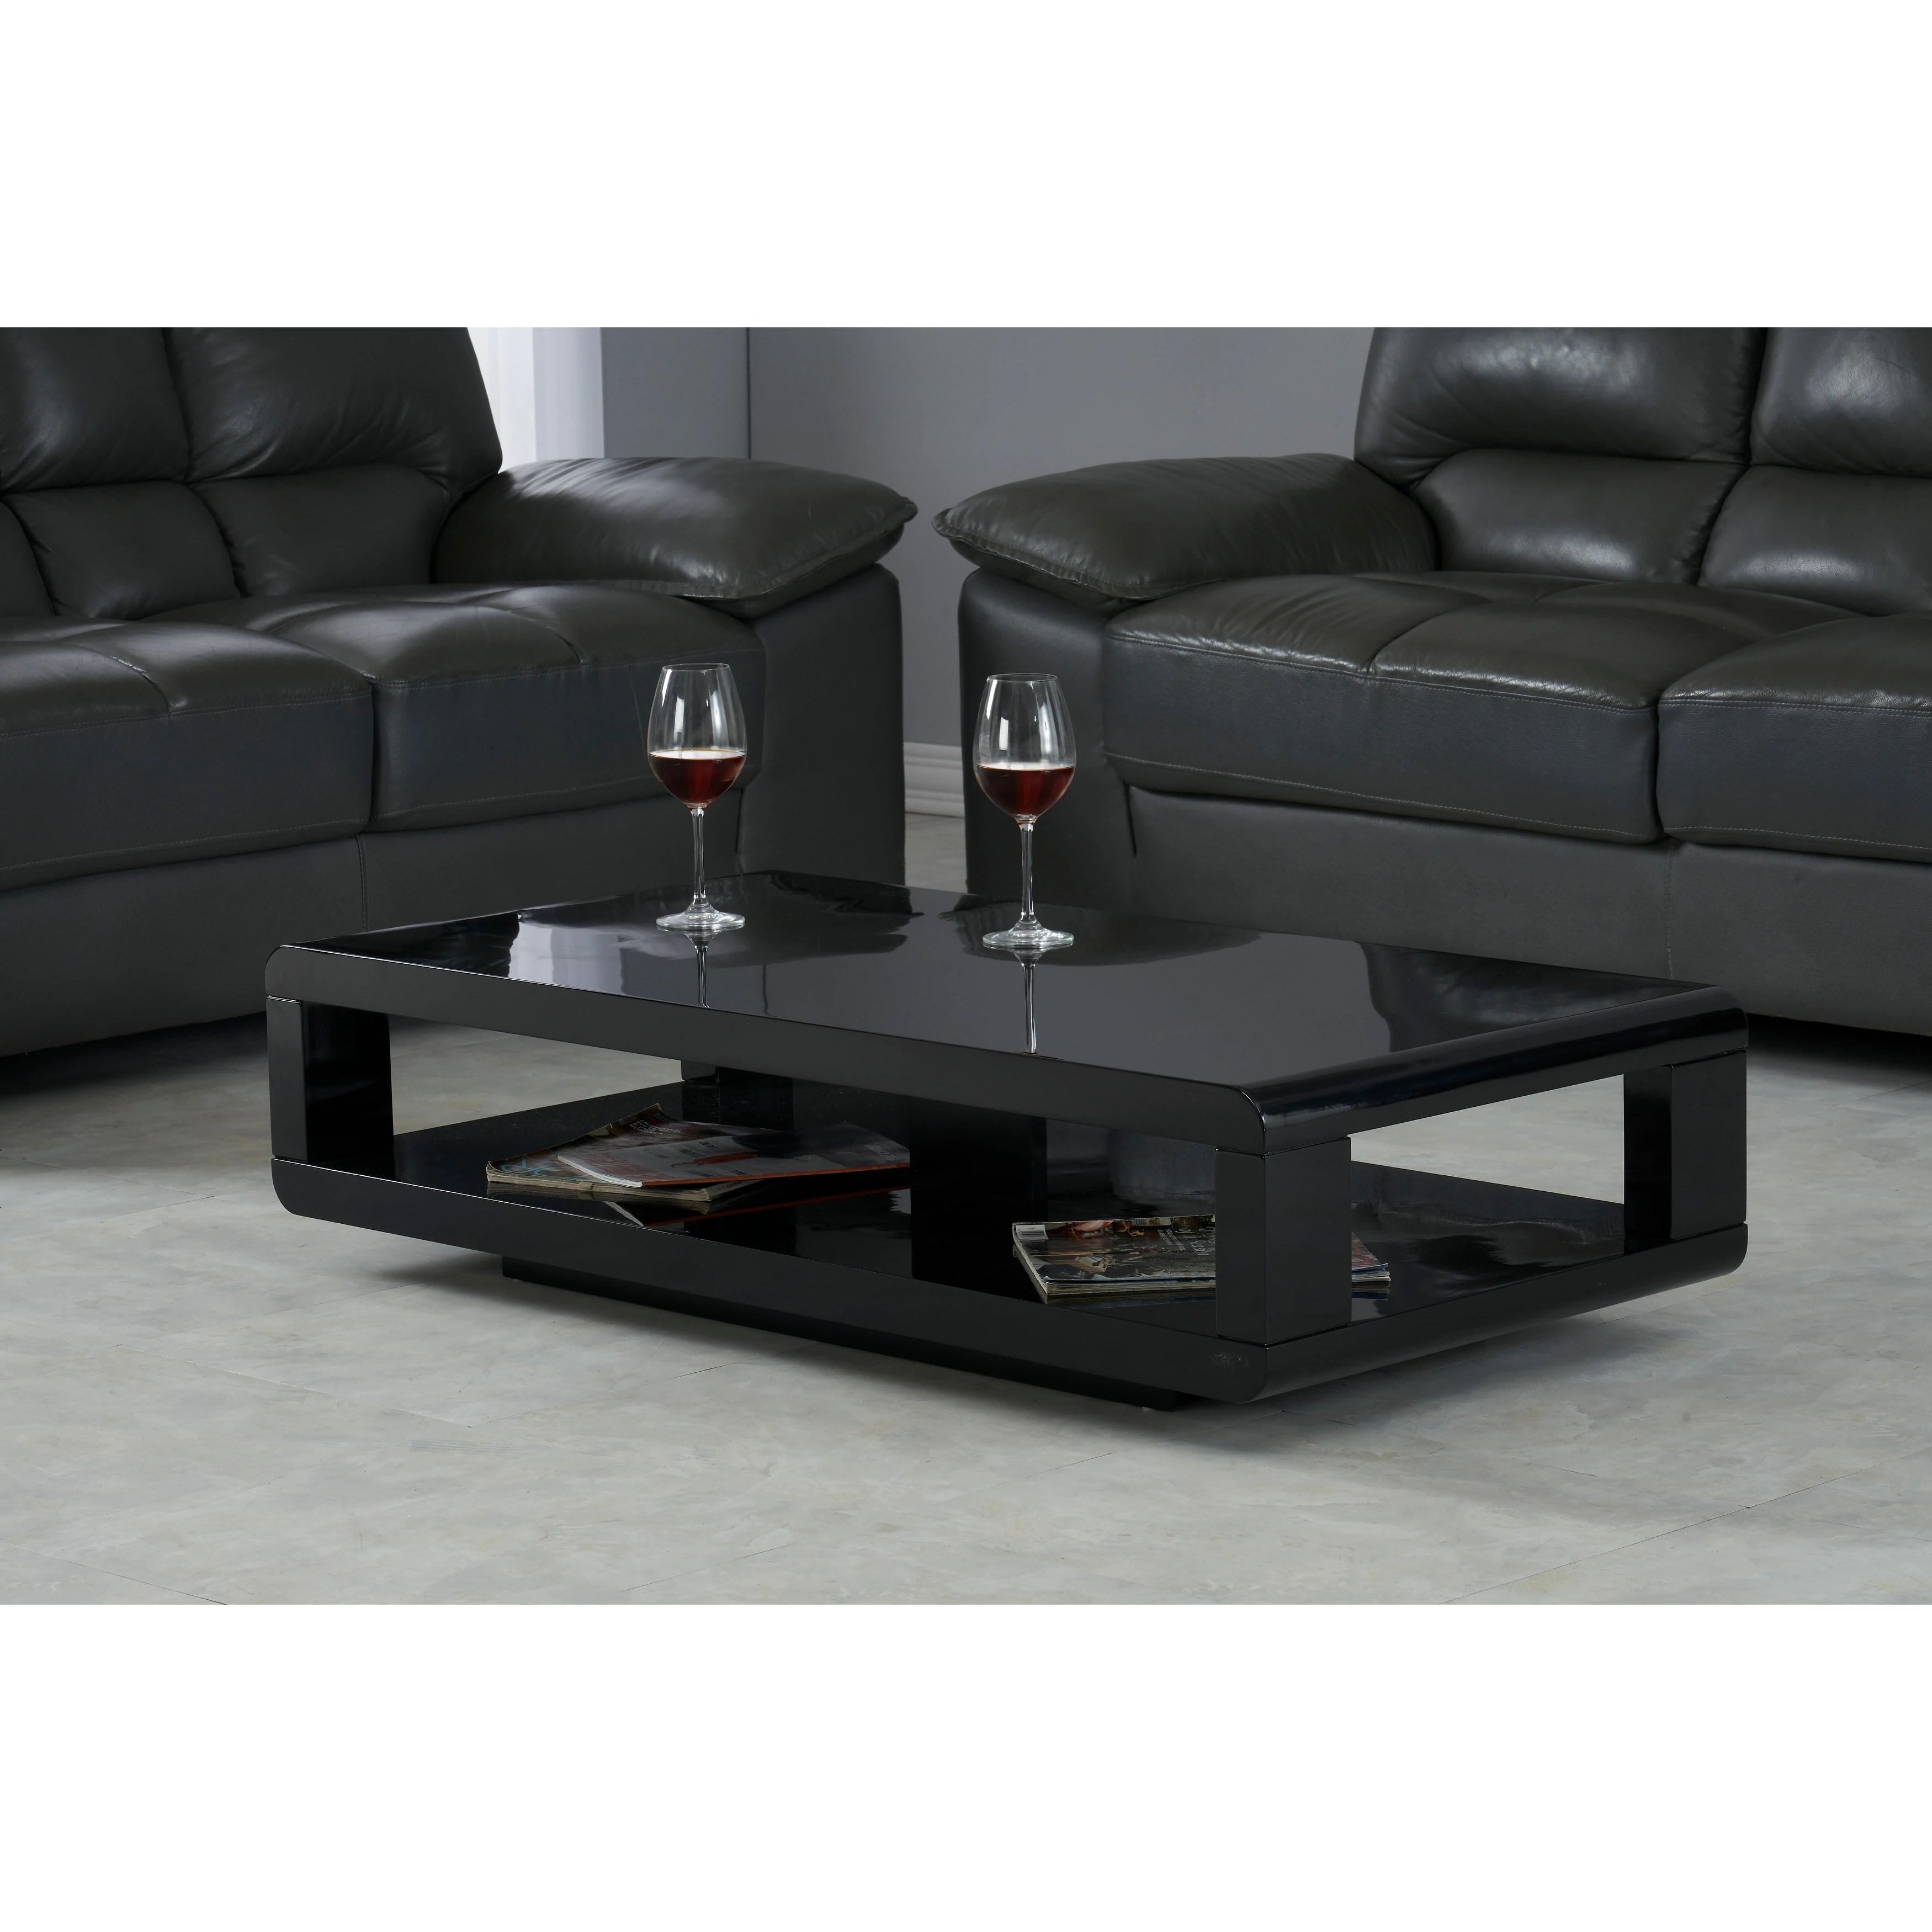 artiva casa modern lacquer coffee table glossy black 48 x24 x12 h